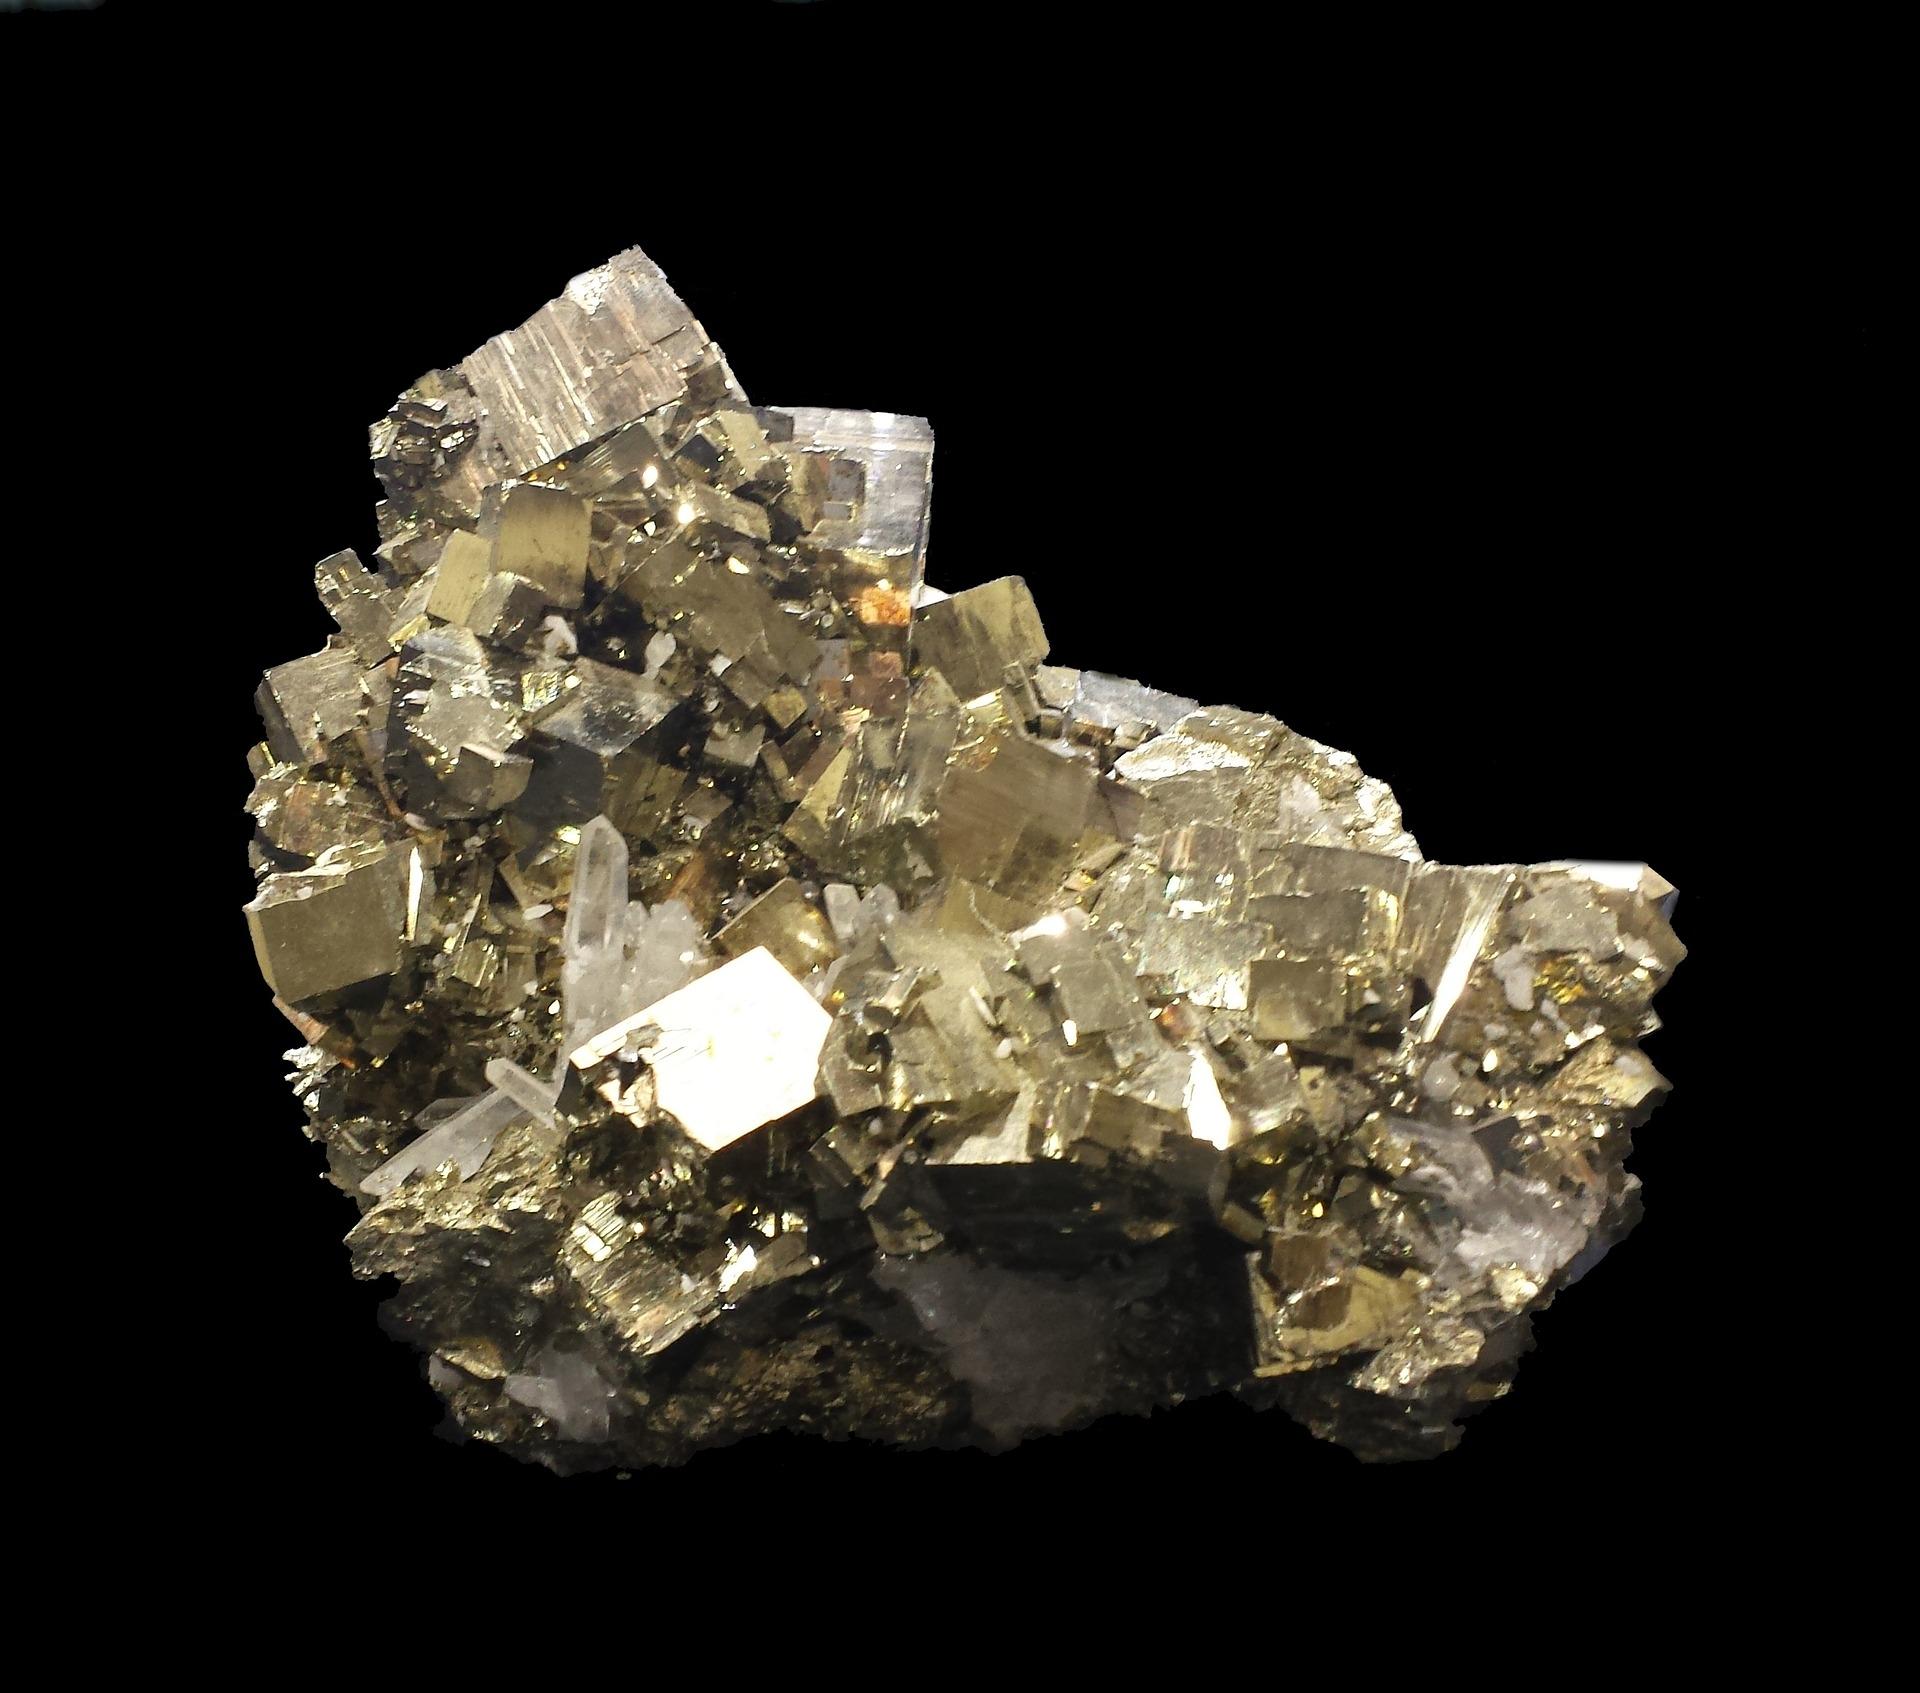 pyrite-1435118_1920